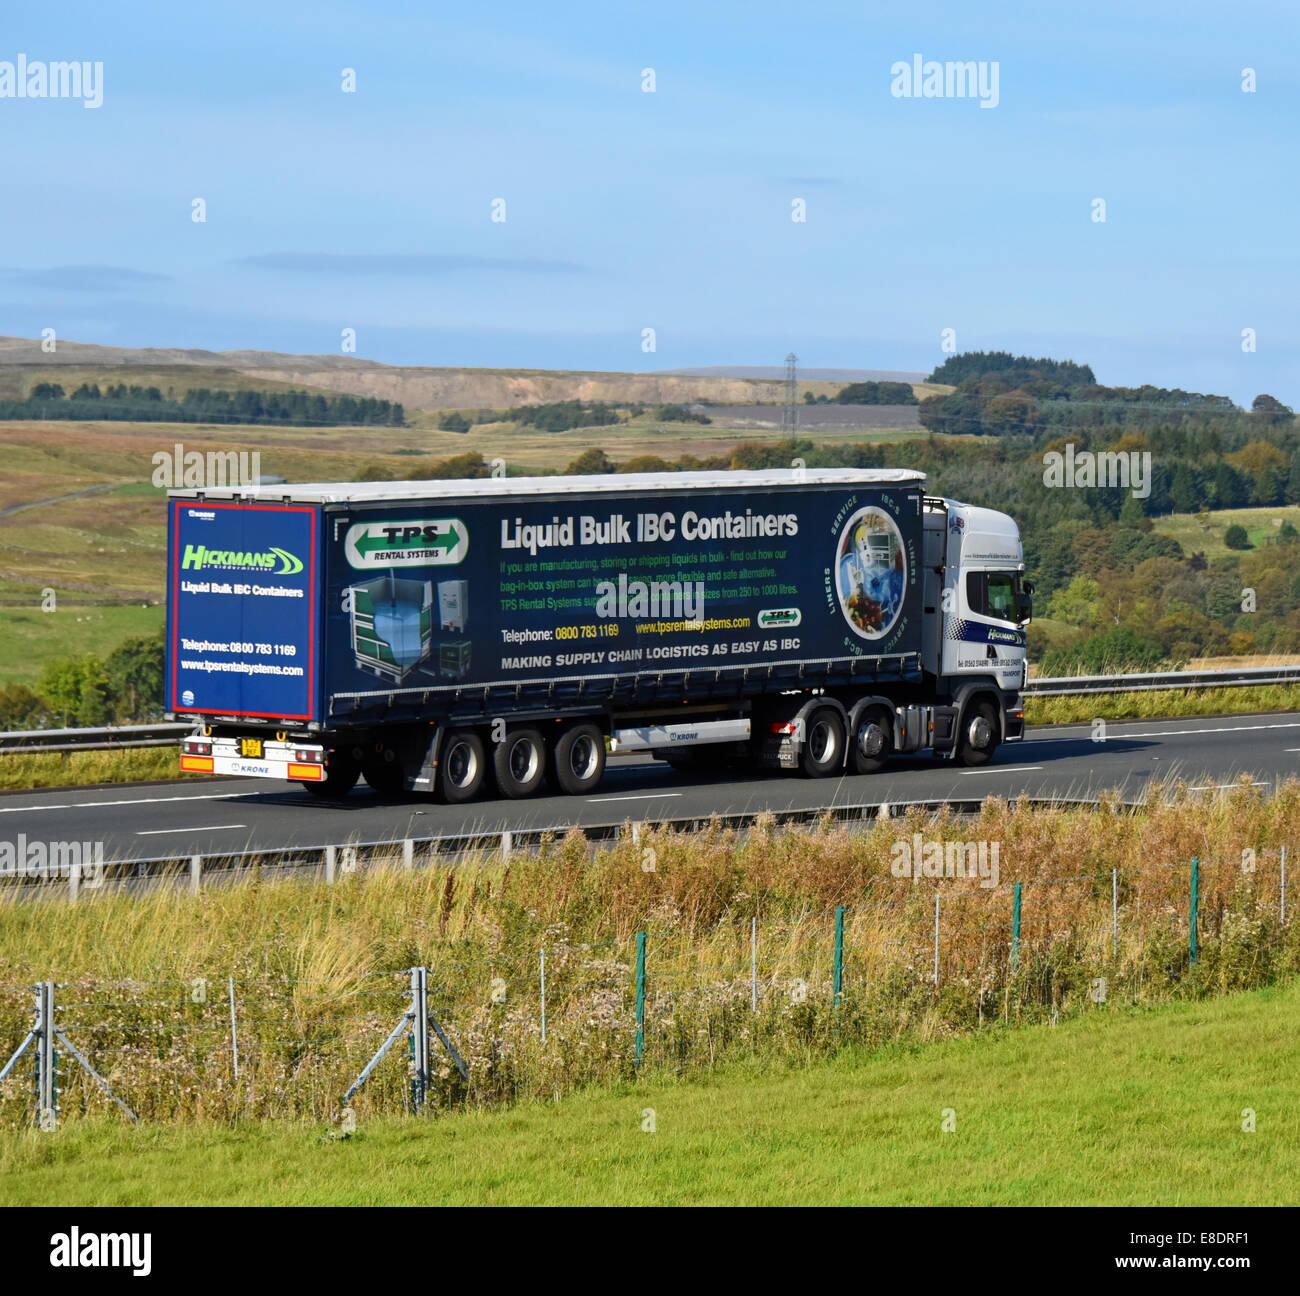 Hickmans of Kidderminster HGV. M6 Motorway, northbound. Shap, Cumbria, England, United Kingdom, Europe. - Stock Image